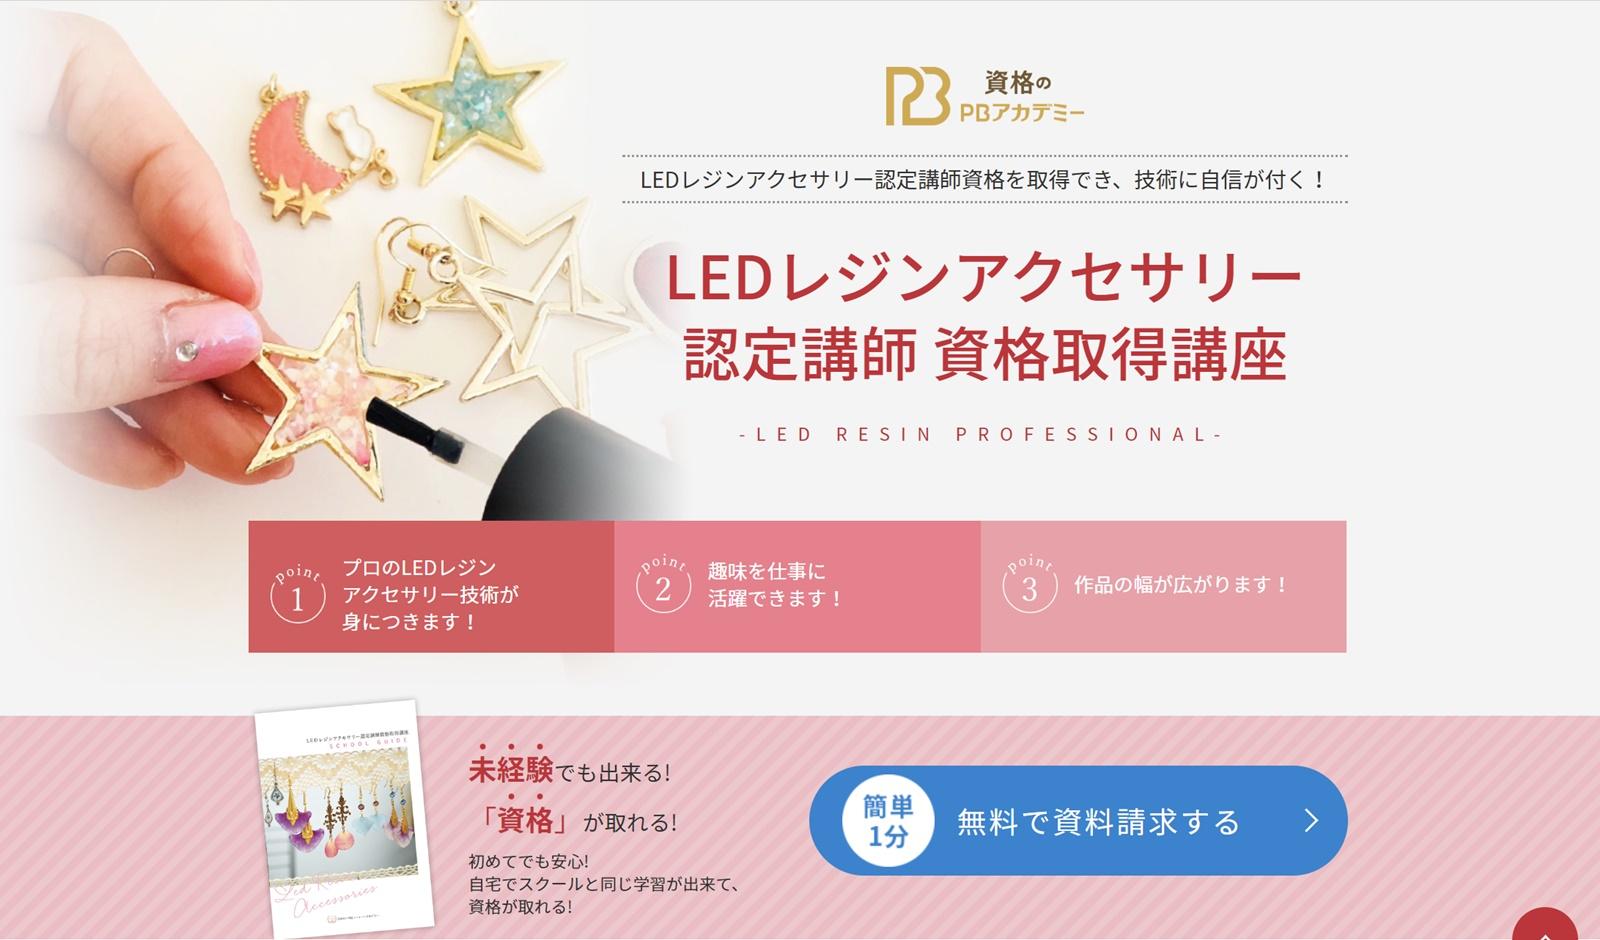 LEDレジンアクセサリー認定講師(PBアカデミー)